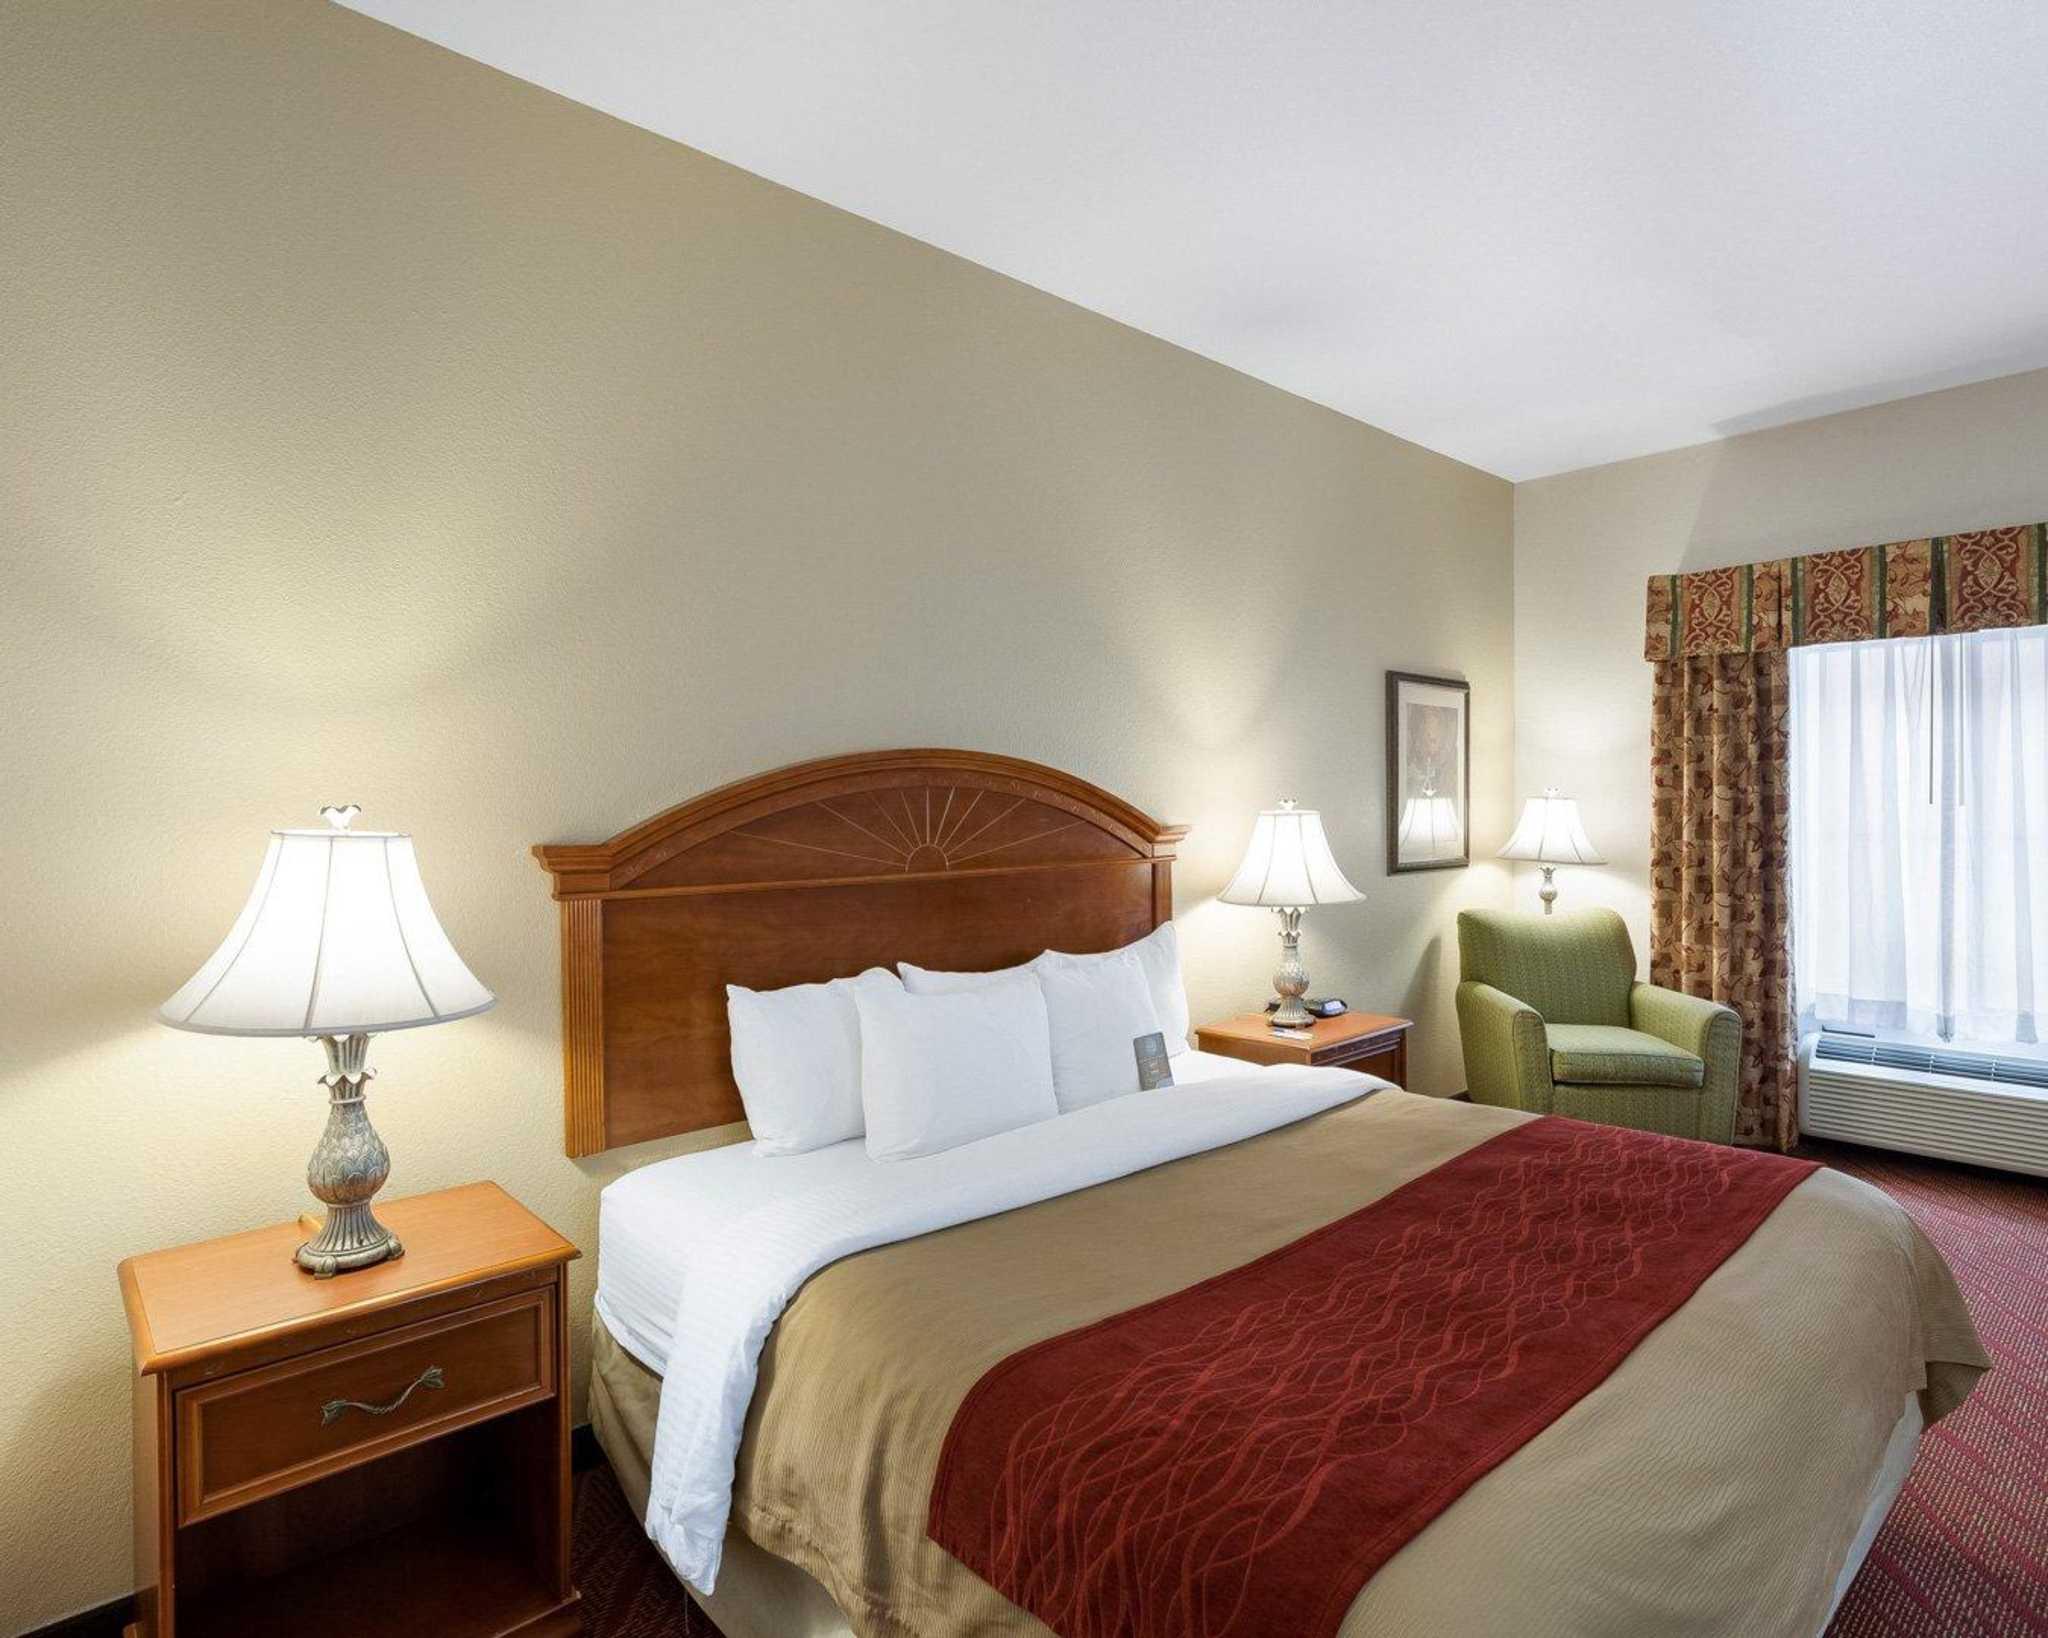 Comfort Inn & Suites Near Medical Center image 17